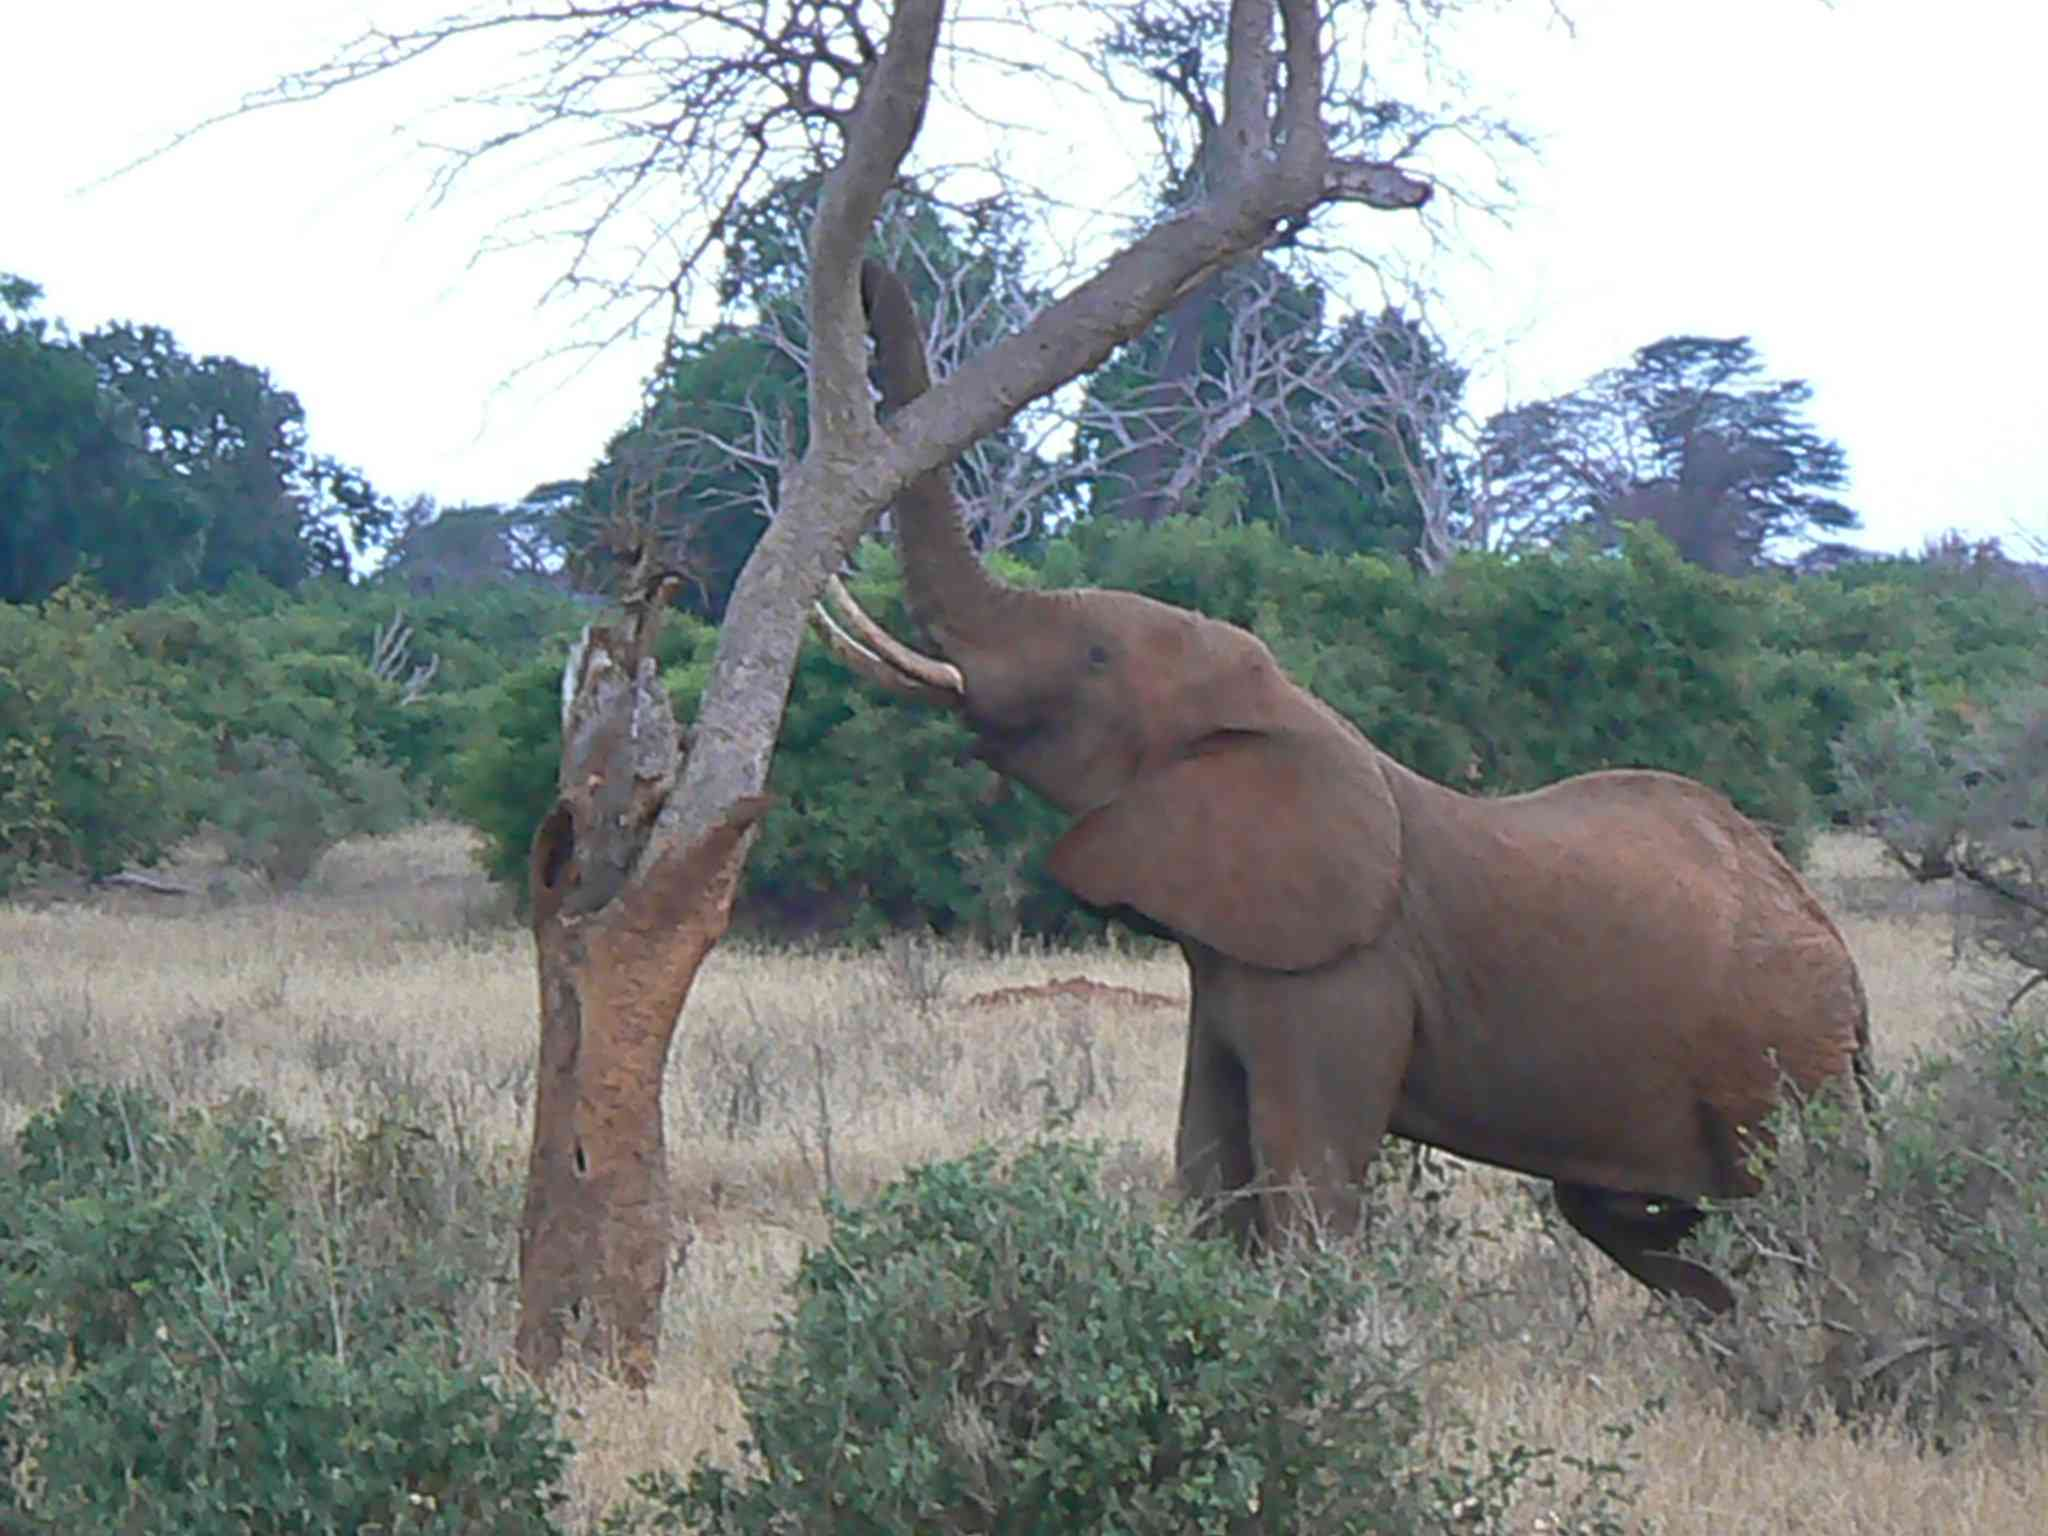 Elephant in Kenya pulling down a tree